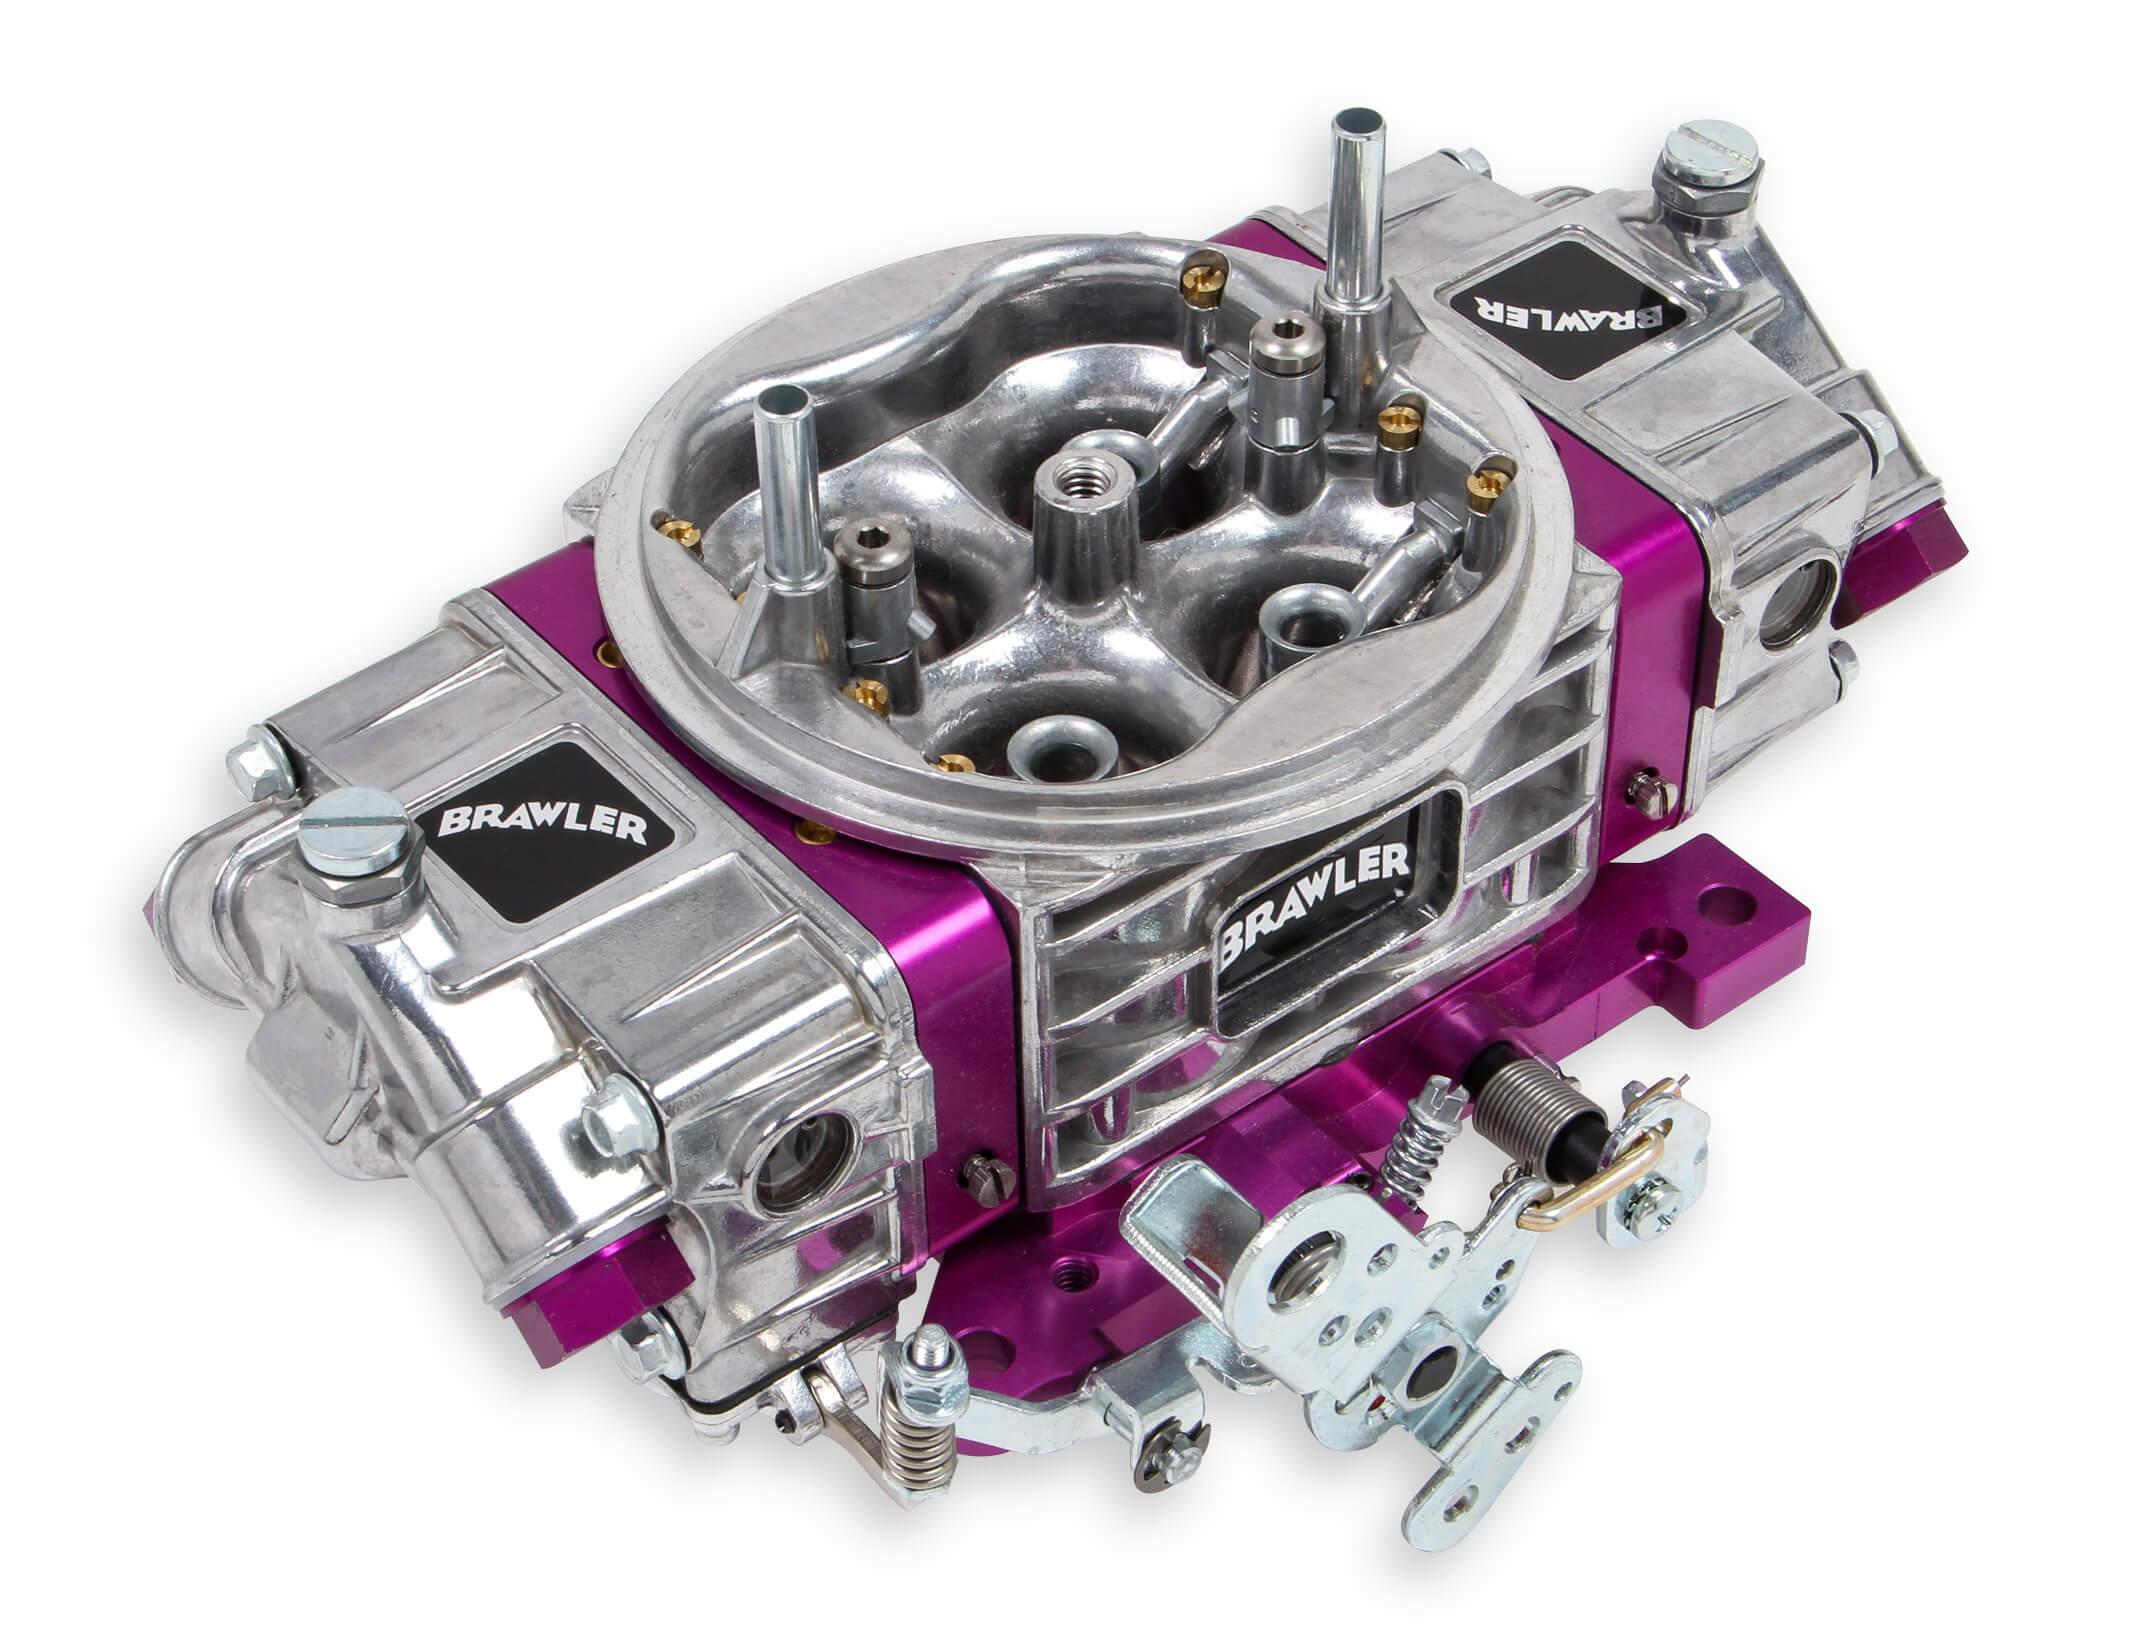 Quick Fuel BR-67215 Carburetor, Brawler Race, 4-Barrel, 750 CFM, Square Bore, No Choke, Mechanical Secondary, Dual Inlet, Polished / Purple Anodize, Each